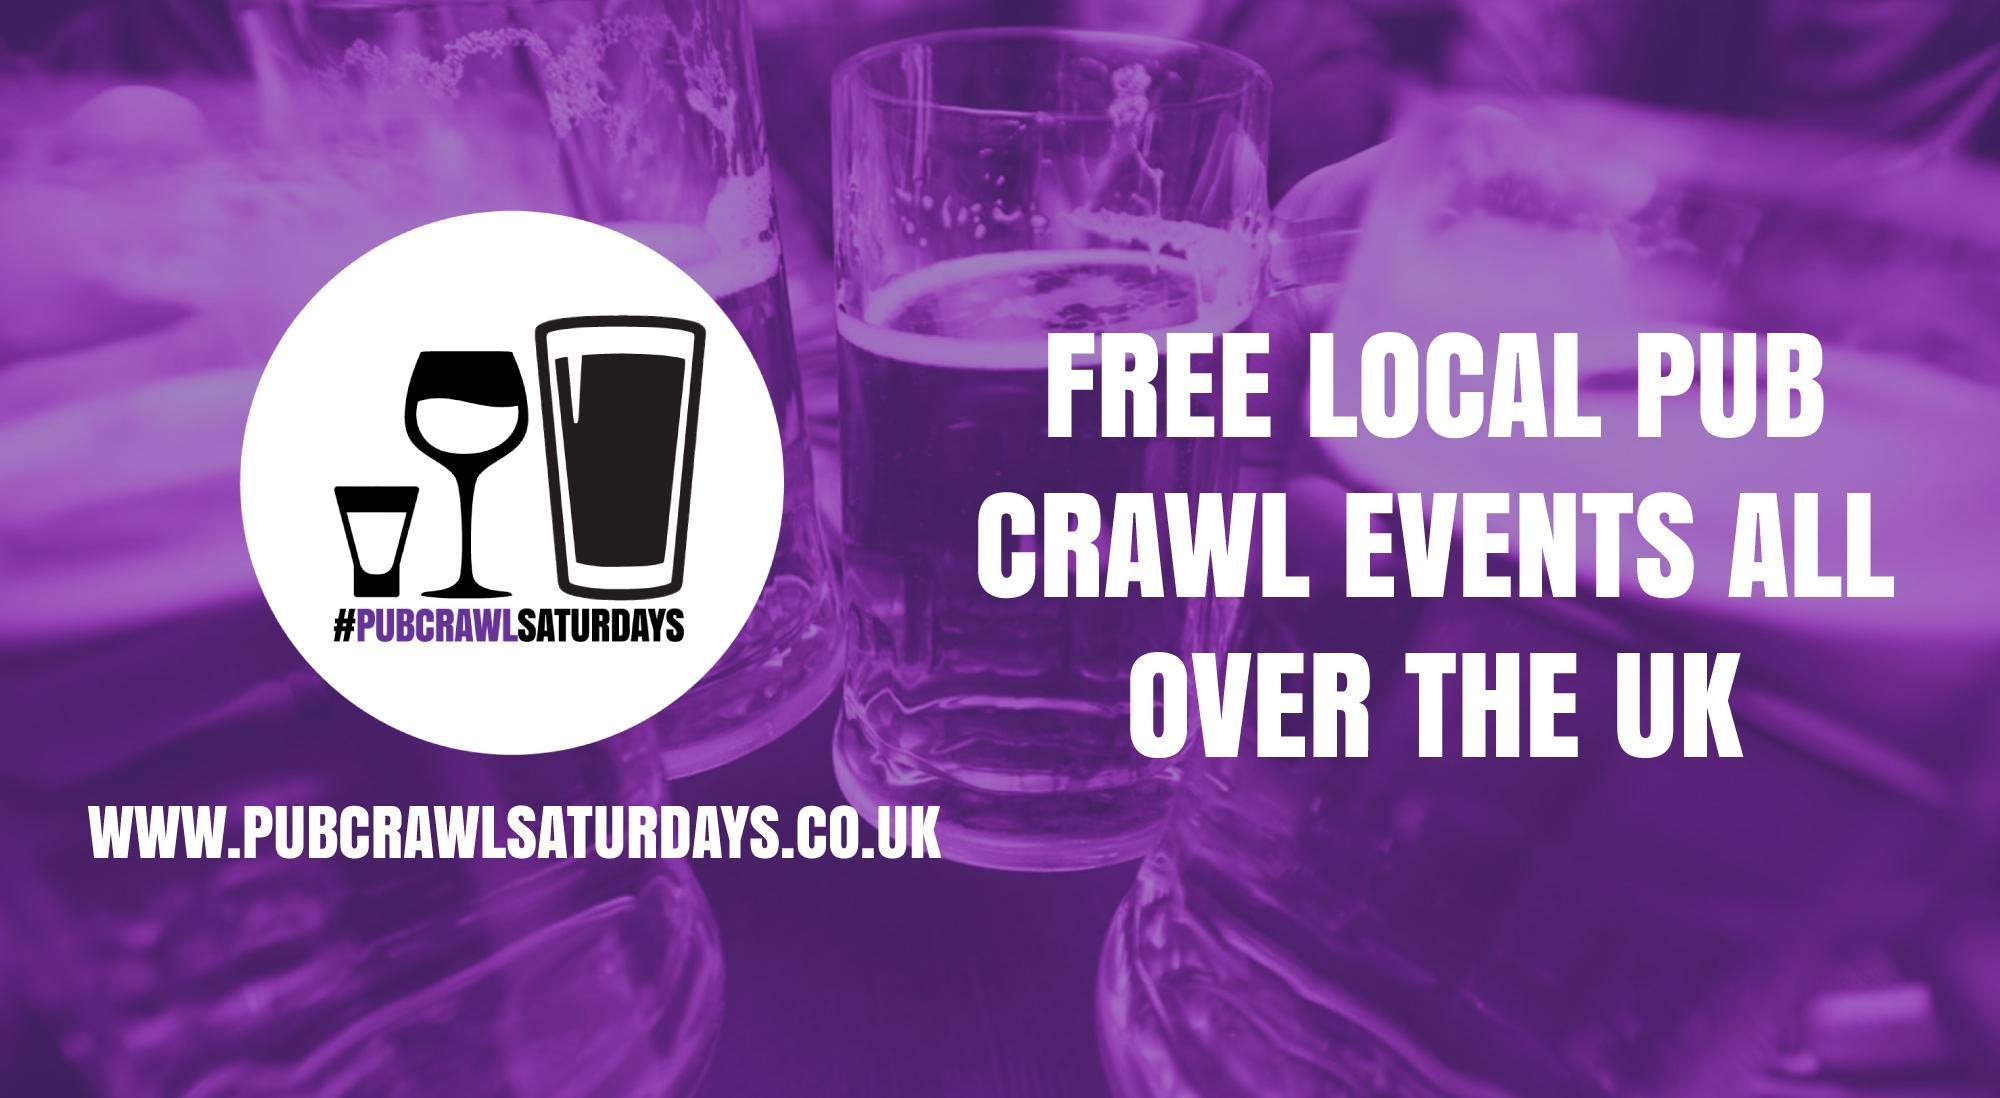 PUB CRAWL SATURDAYS! Free weekly pub crawl event in Melton Mowbray